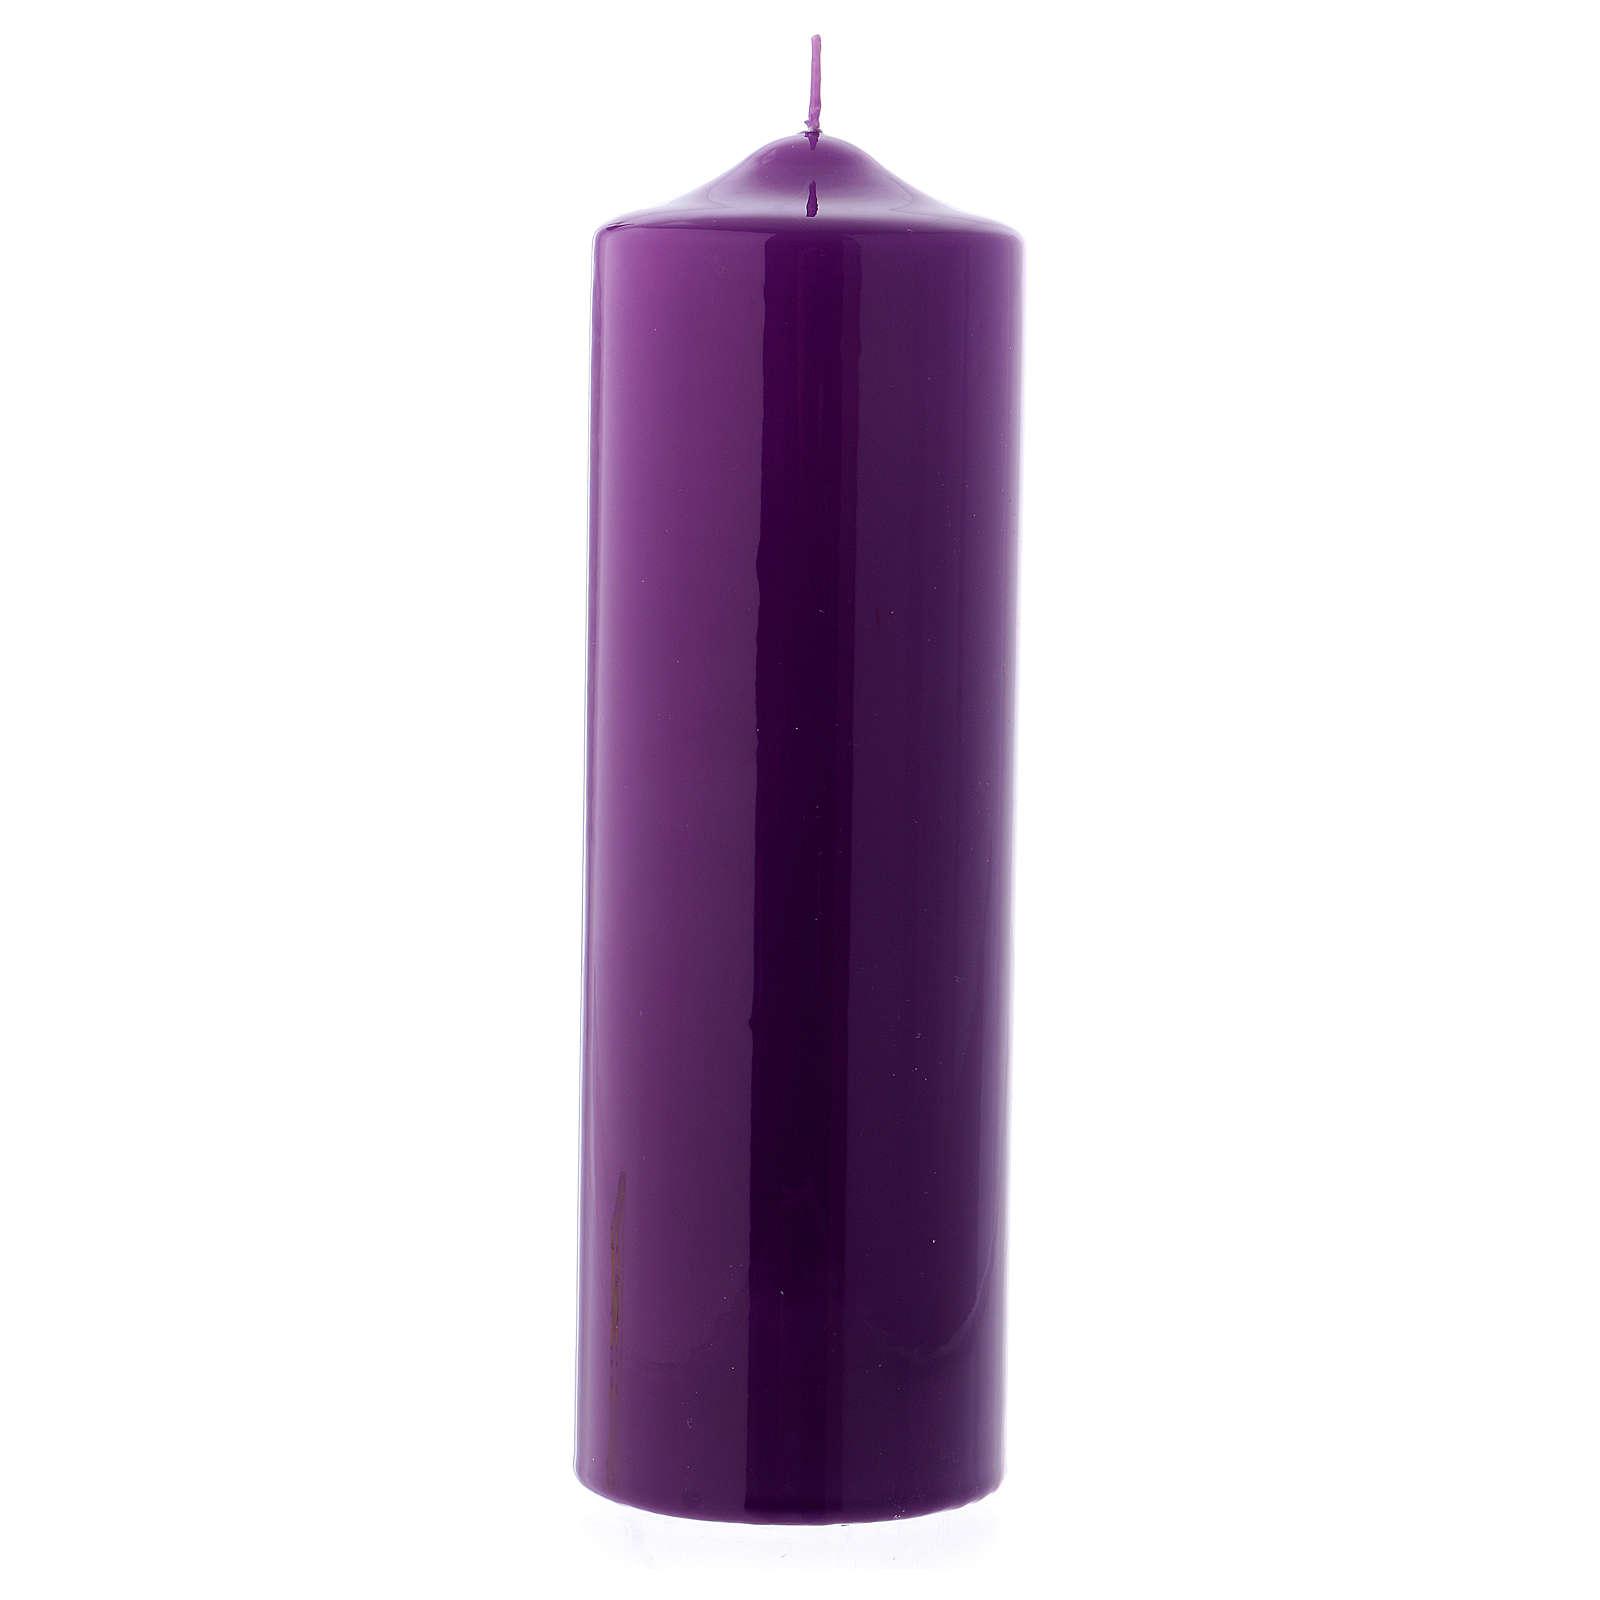 Bougie liturgique cire brillante Ceralacca 24x8 cm violet 3